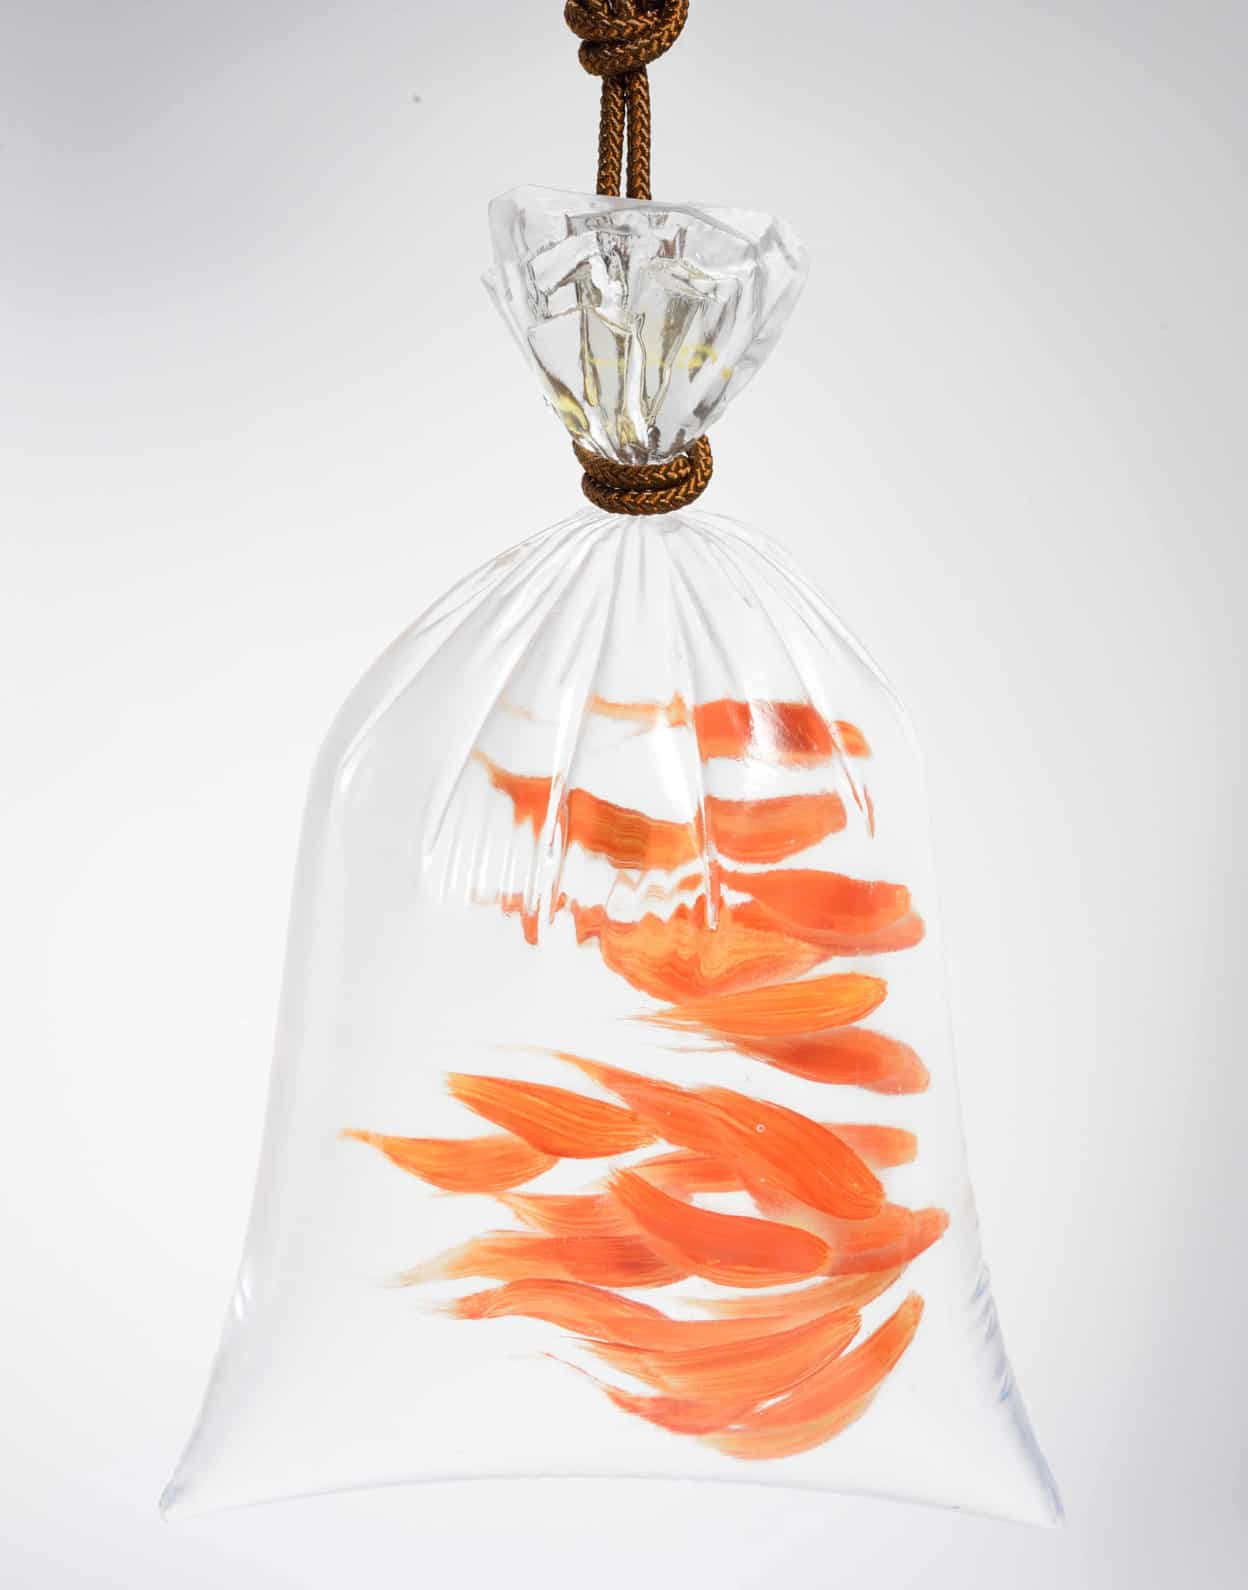 goldfish by riusuke fukahori 6